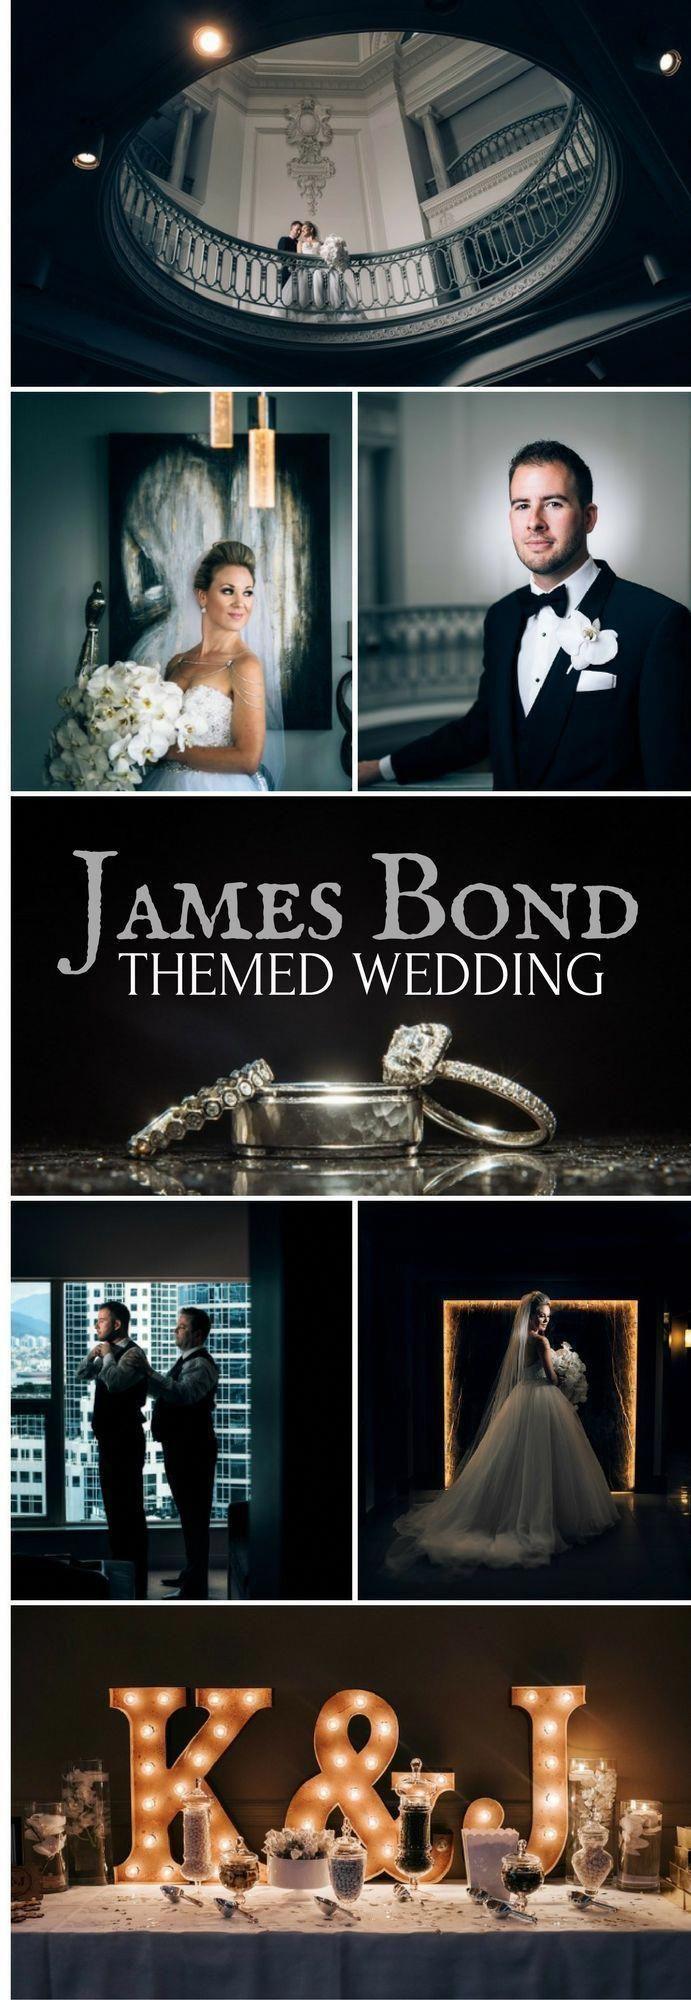 James bond themed wedding elegant and romantic movie inspired